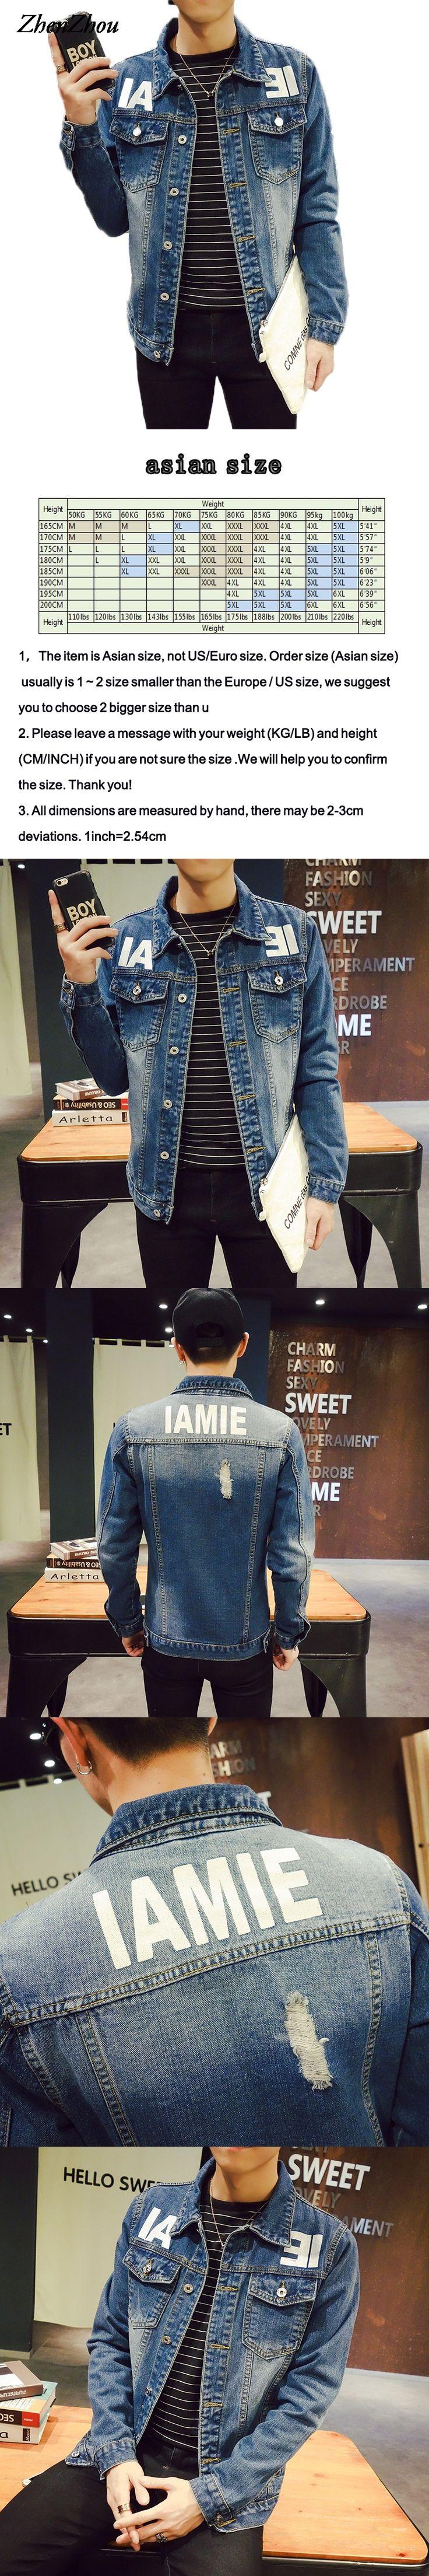 ZhenZhou S-5XL Male Denim Jackets Jaqueta Jeans Masculino JC30  Bomber Jacket Men Veste Homme Chaquetas Hombre 2016